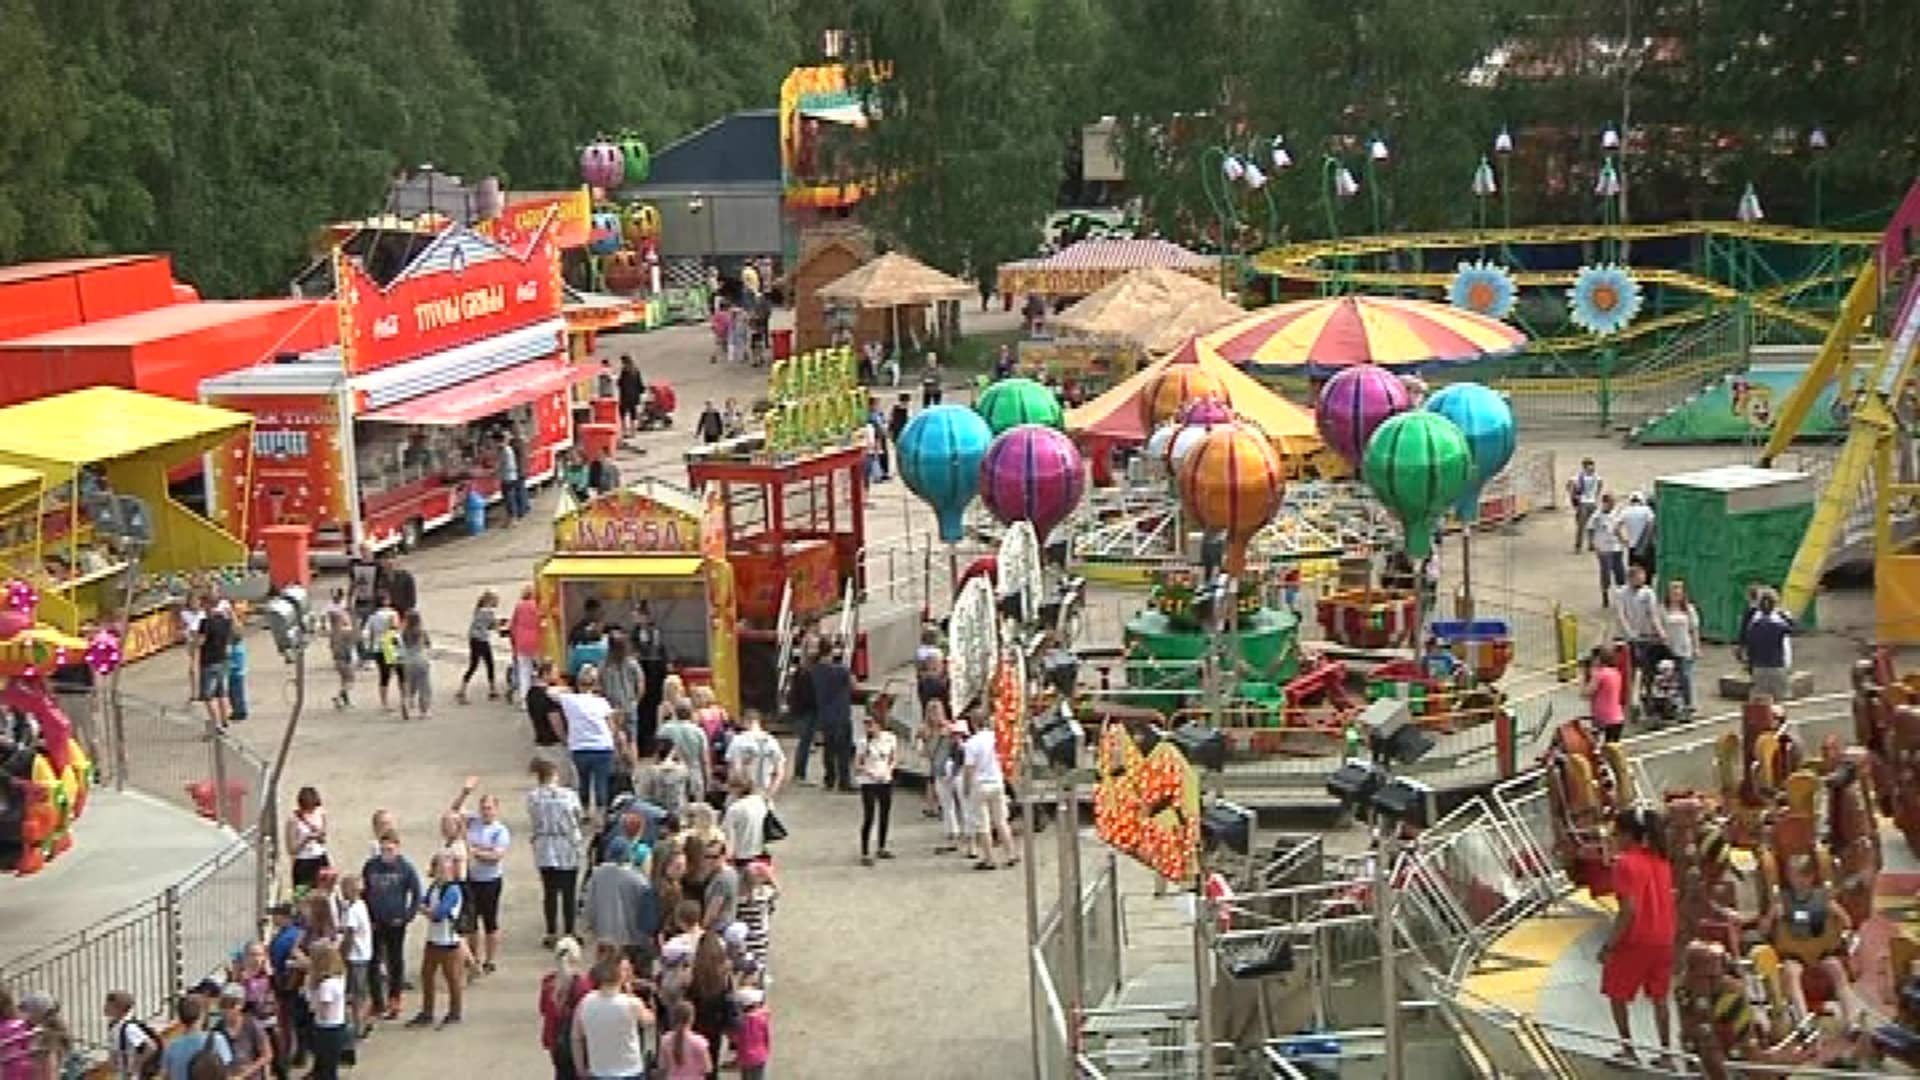 Suomen Tivoli, Ounaspaviljonki, Rovaniemi